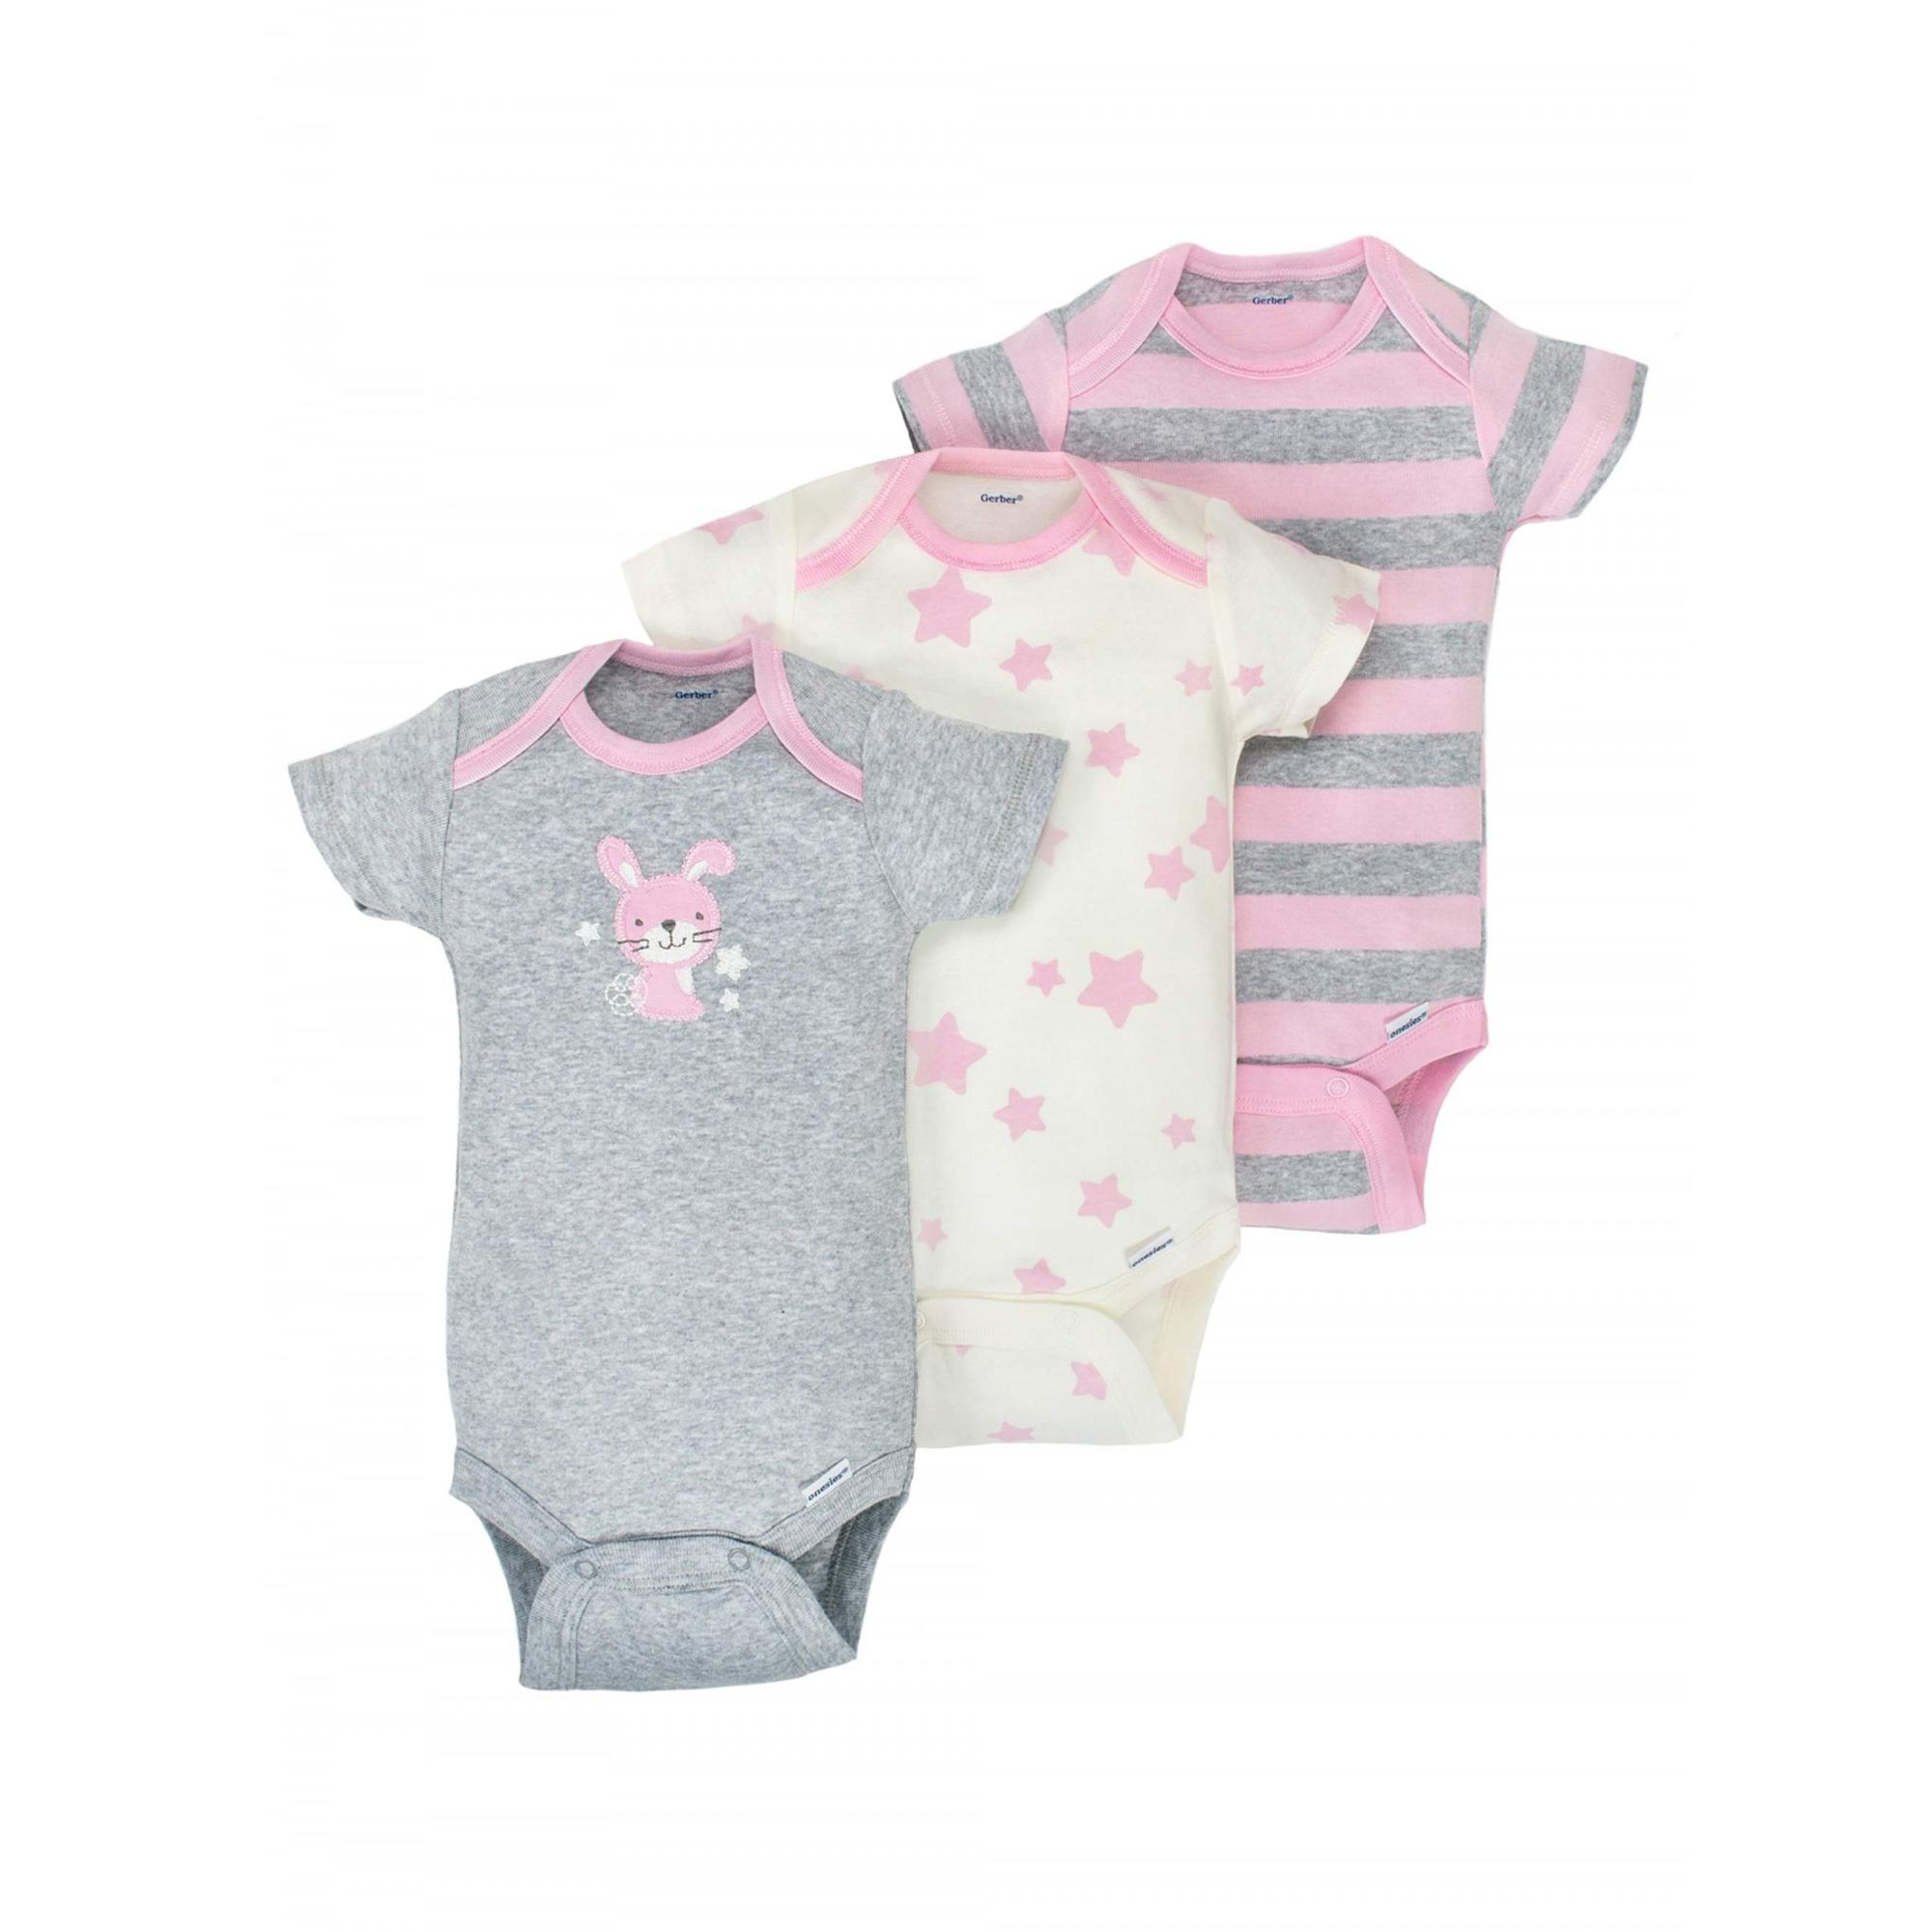 What A Cute Tea Baby Onesie Shirt Shower Gift Funny Newborn Clothes Gerber